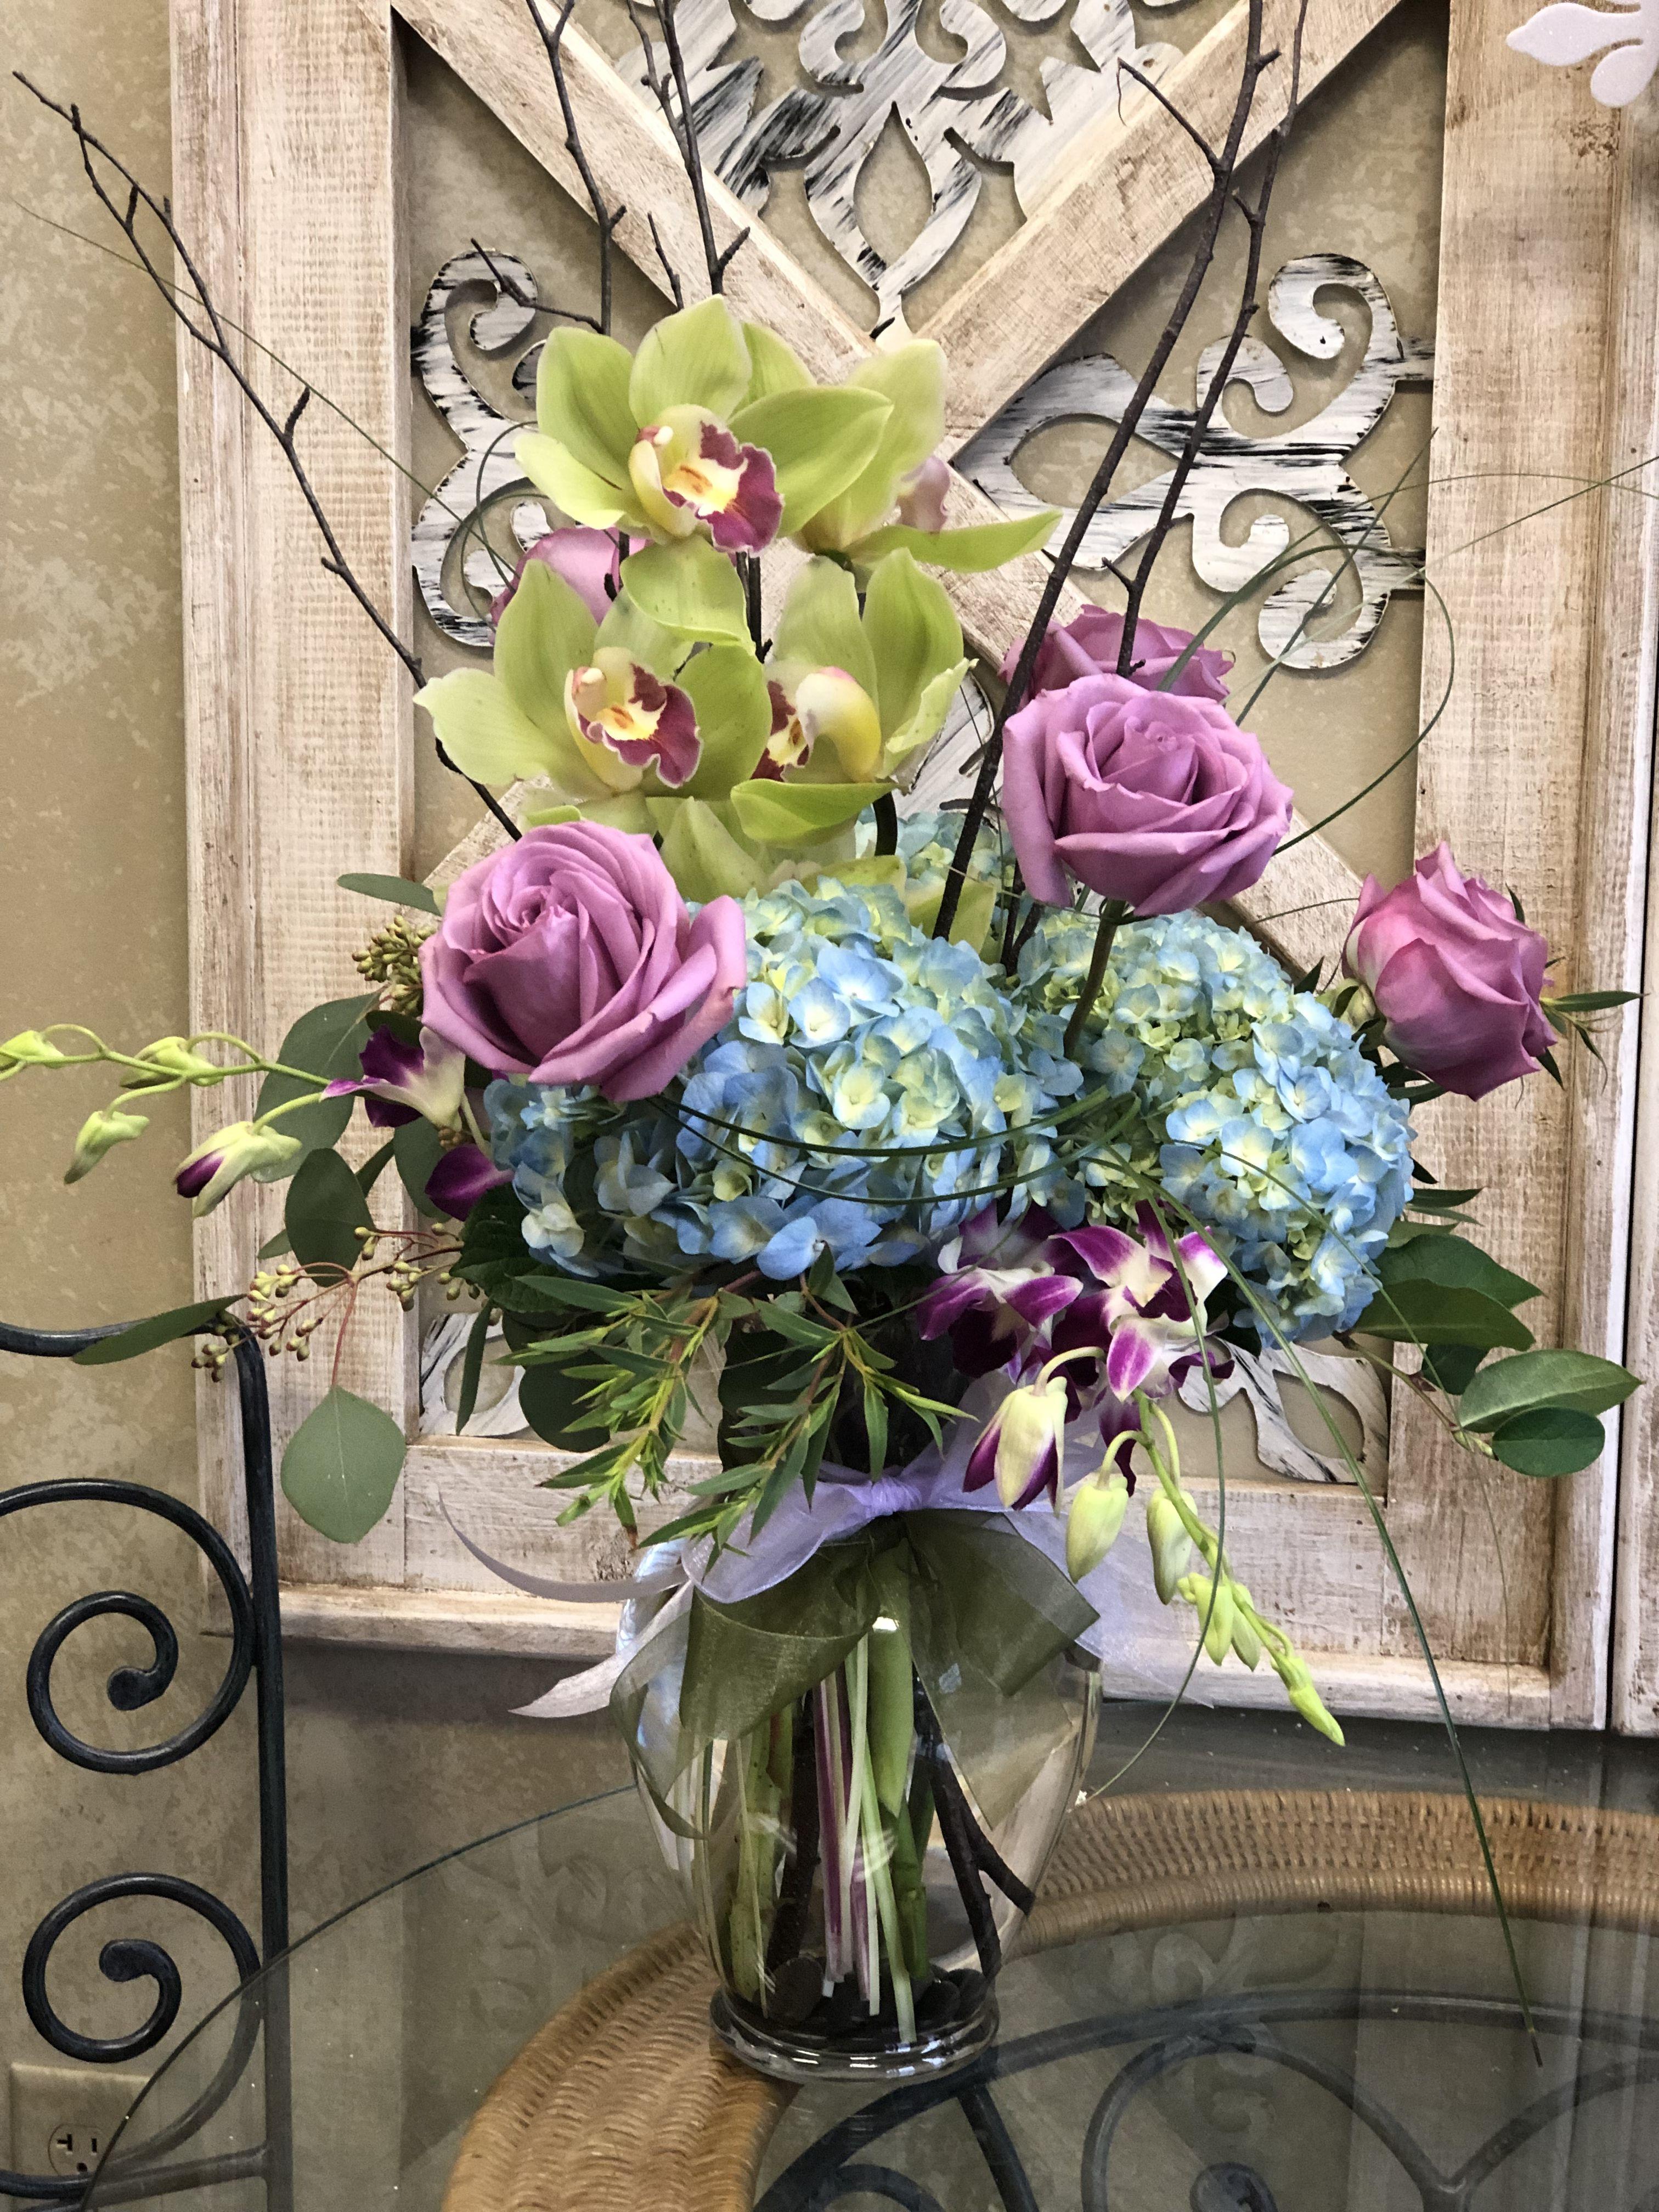 Green orchids blue hydrangeas lavender roses fresh